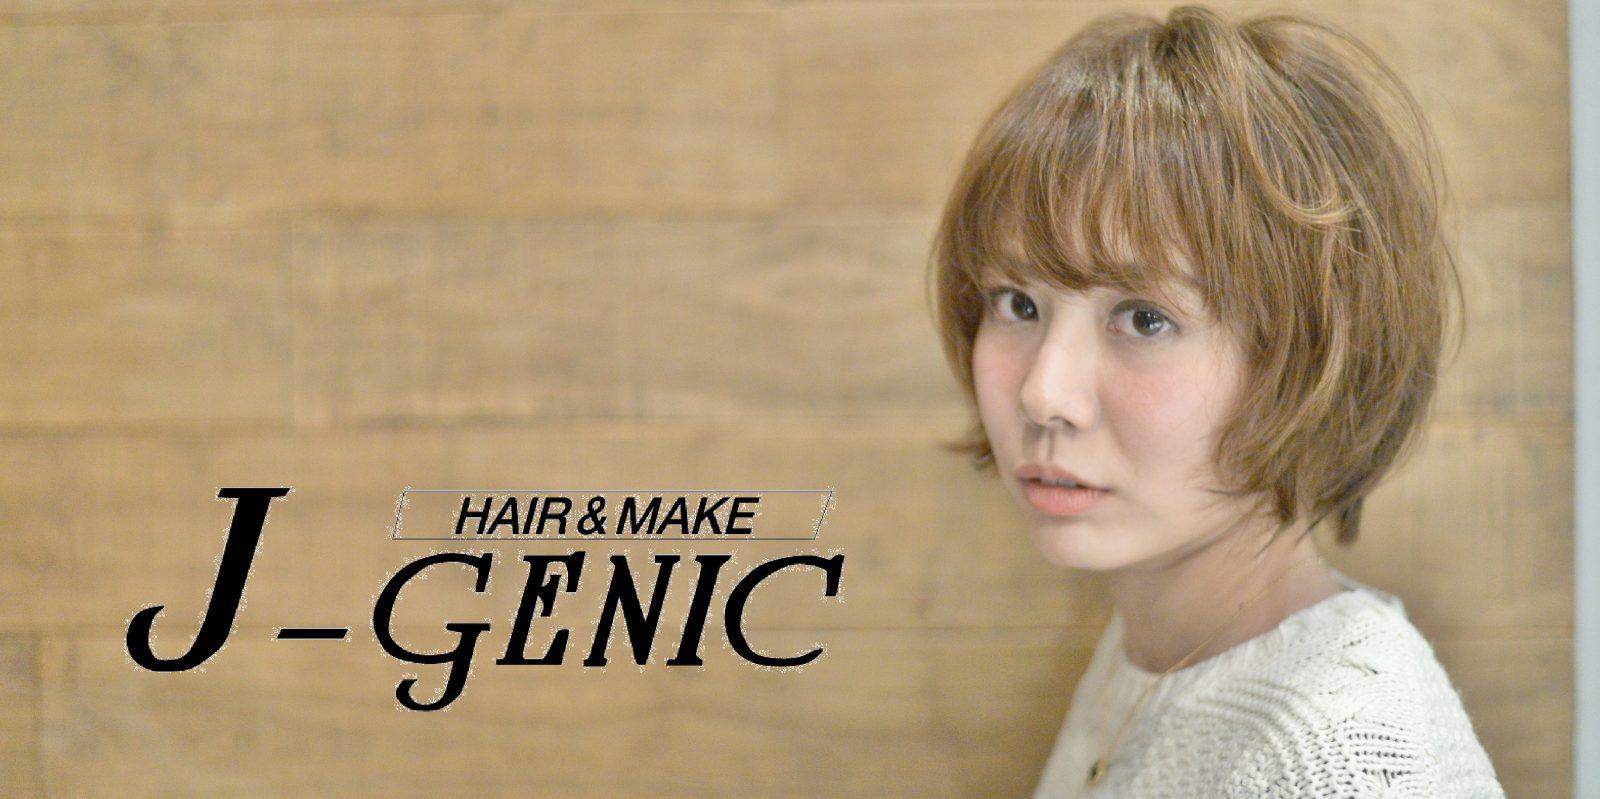 J-GENIC Blog